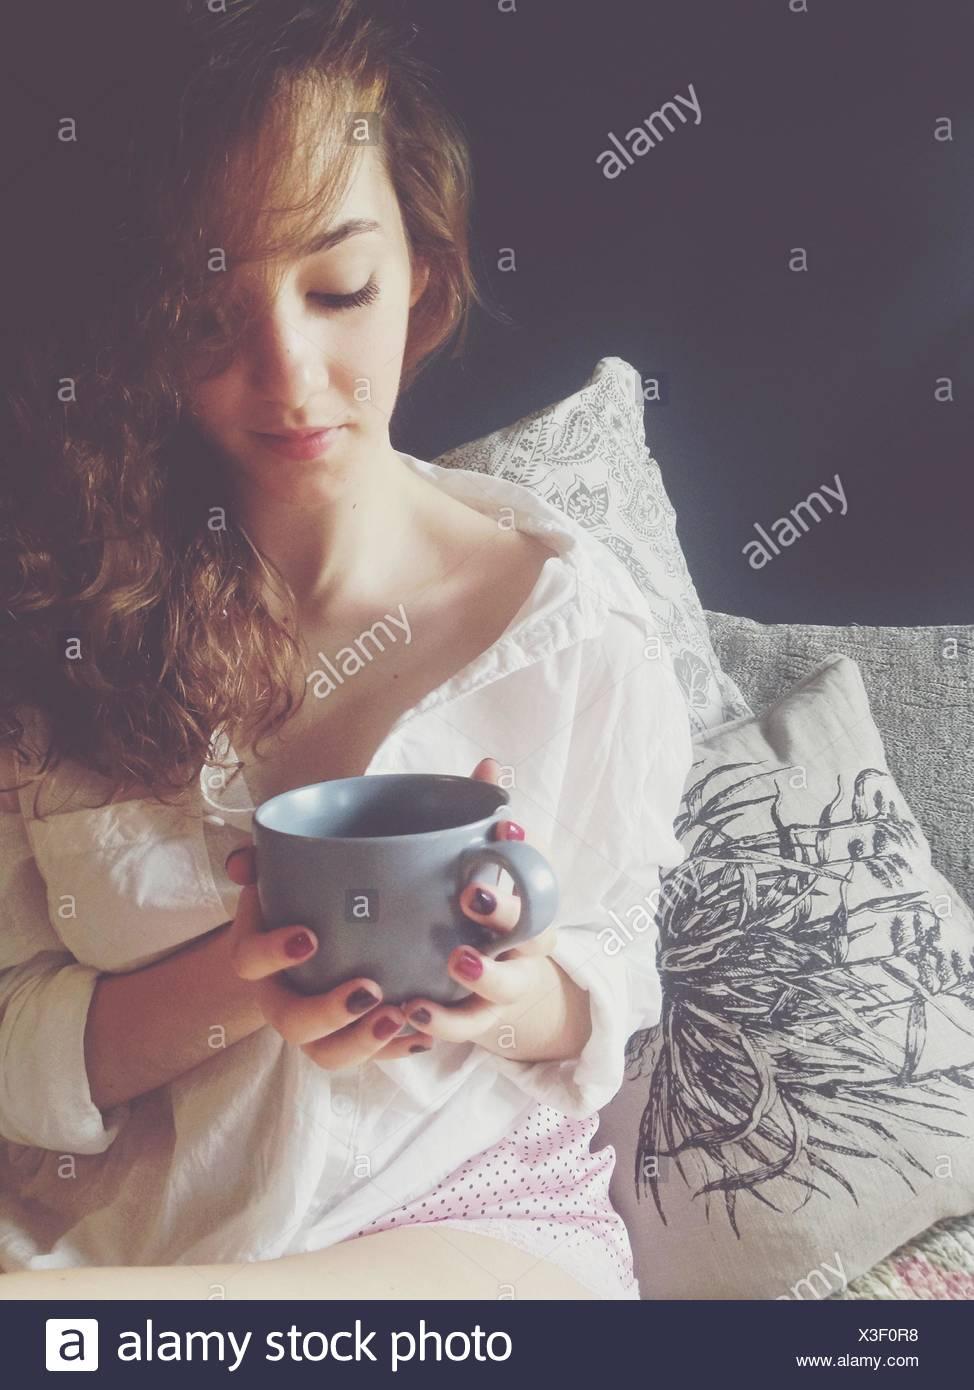 Woman Drinking Coffee - Stock Image